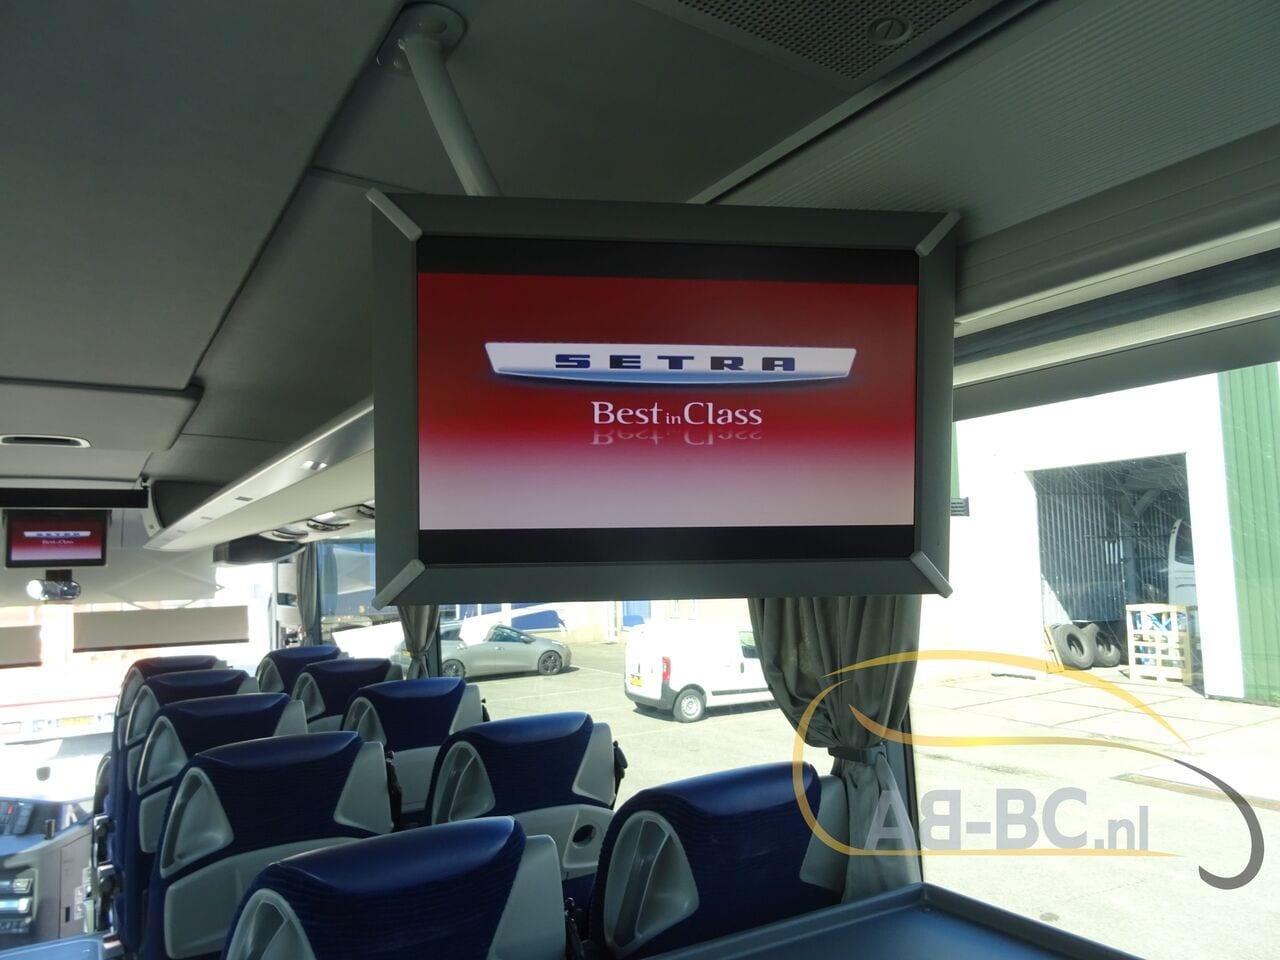 coach-busSETRA-S415-GT-HD-FINAL-EDITION-51-SEATS-LIFTBUS---1620382049286251312_big_99330332ca846035be81acc48ad578bc--21050713010665719300